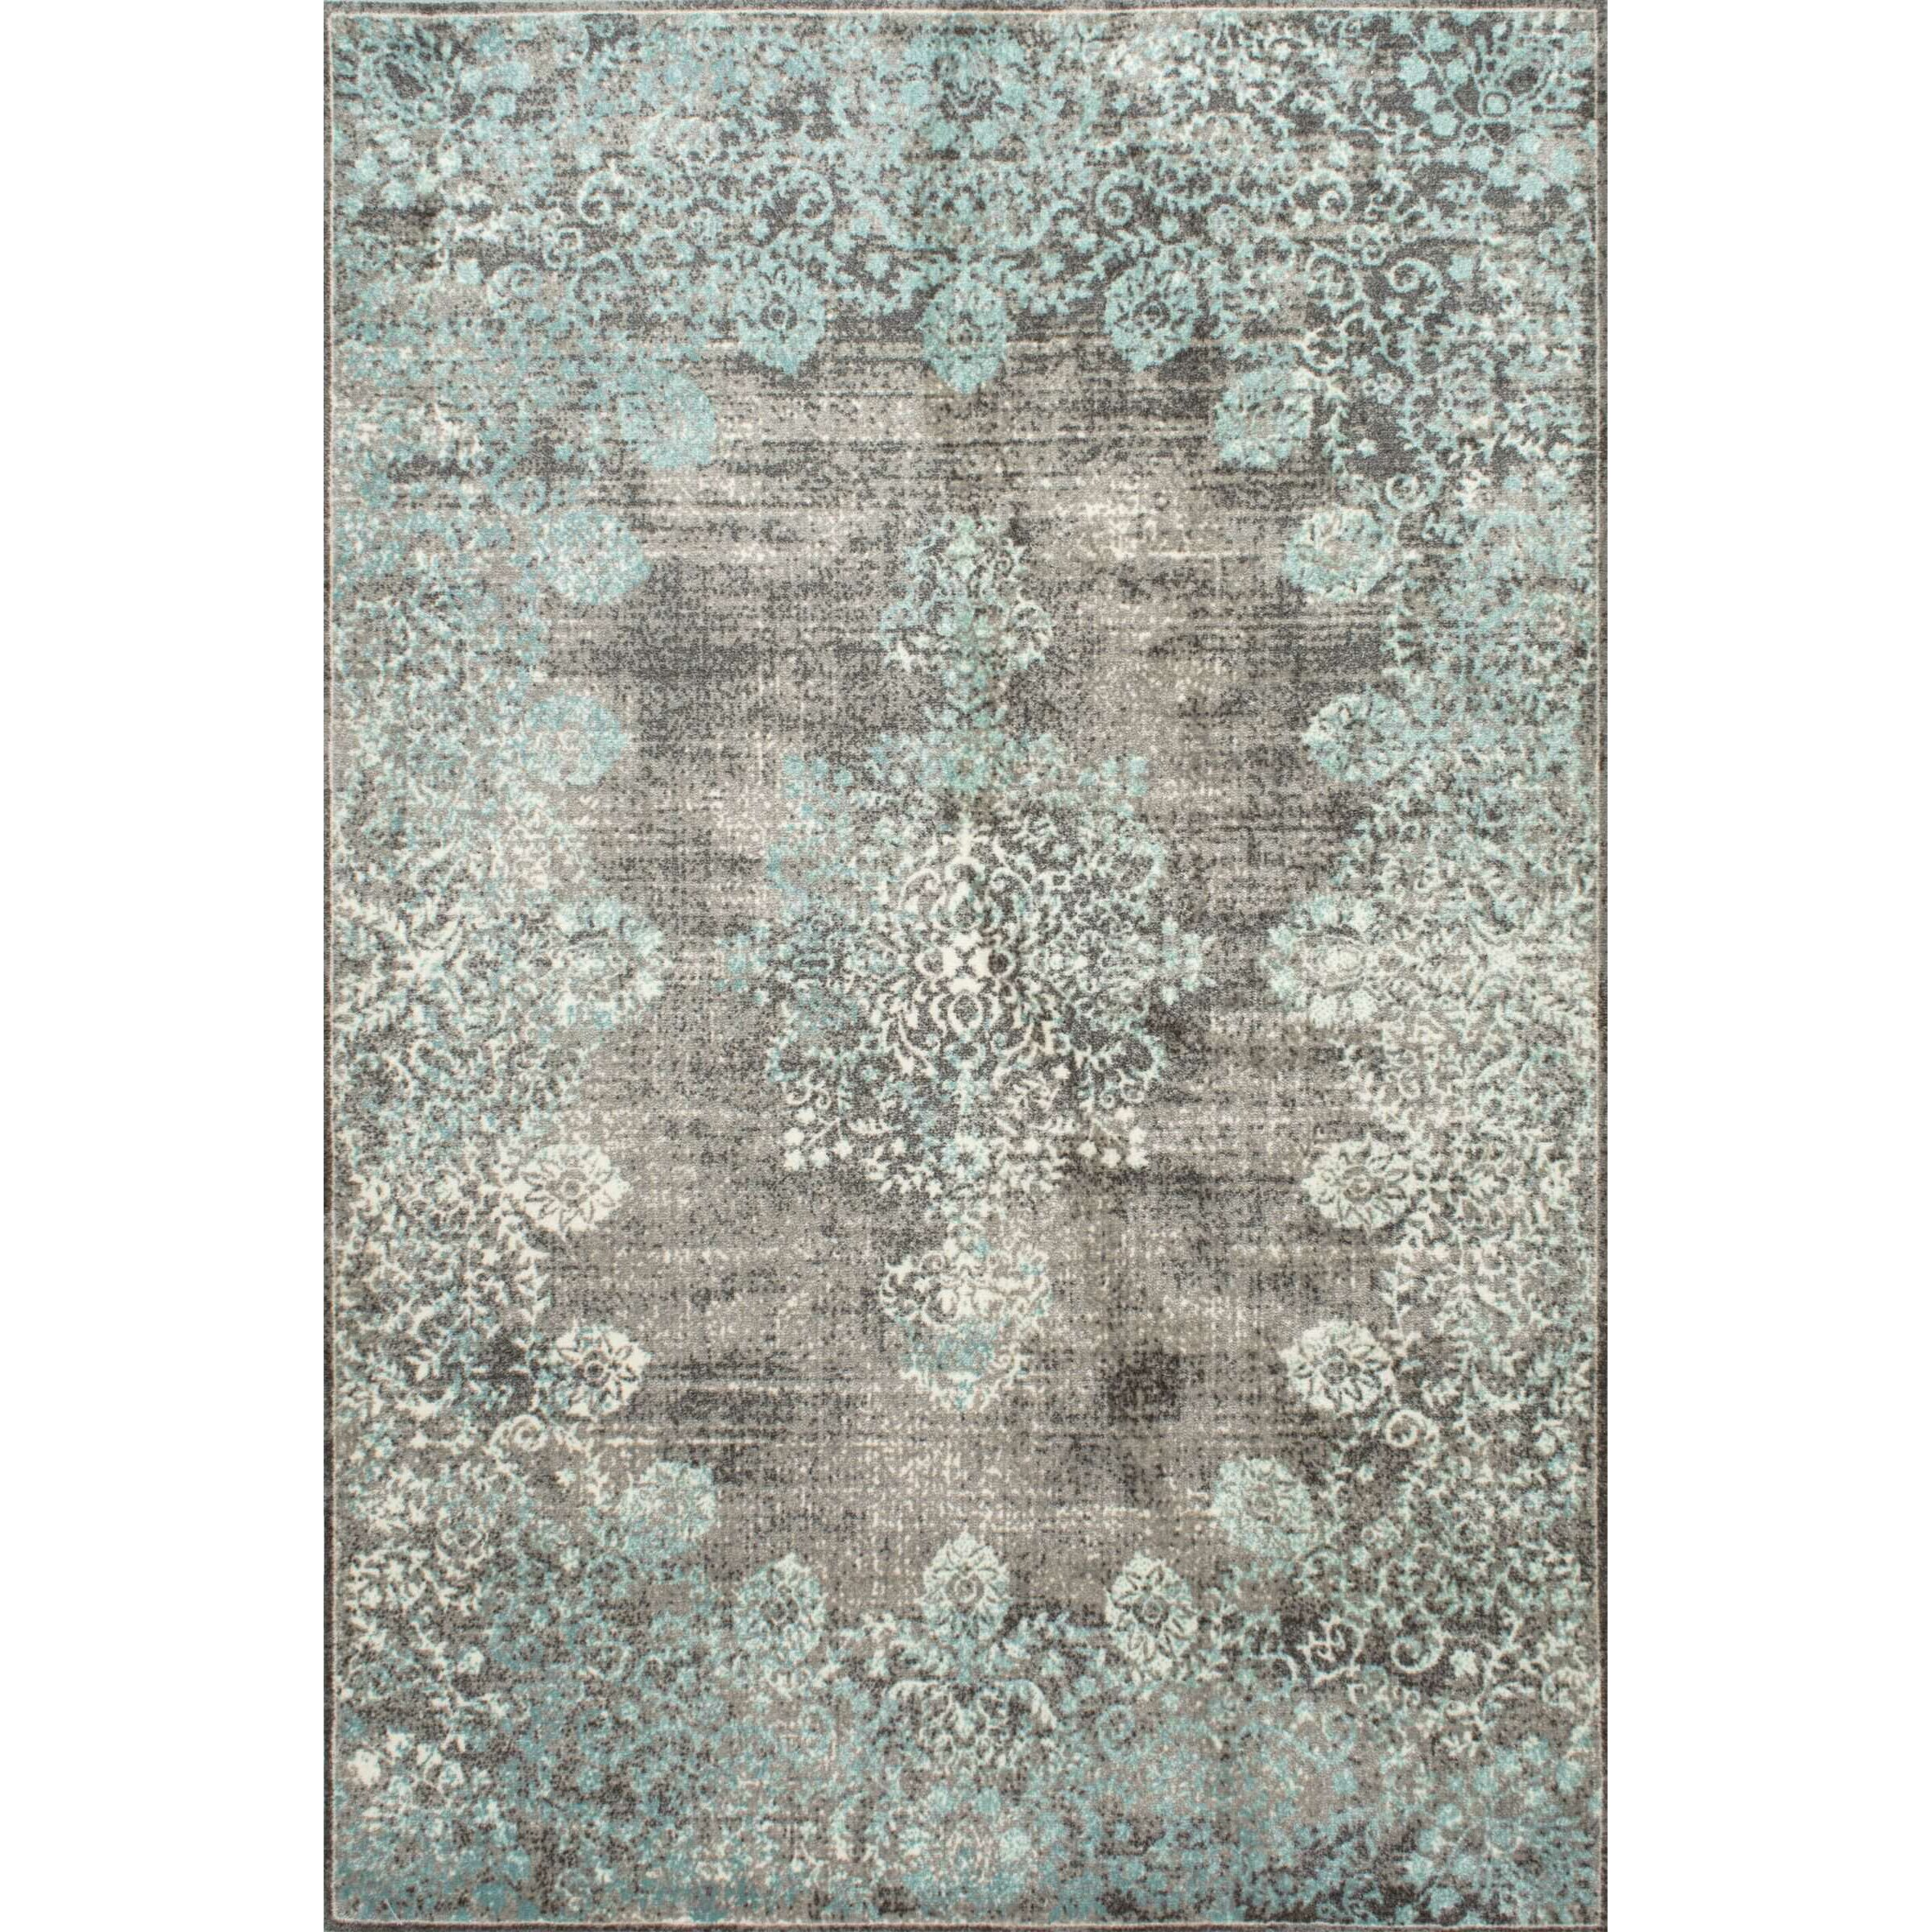 Saleya Turquoise Area Rug: Bungalow Rose Damone Blue Area Rug & Reviews